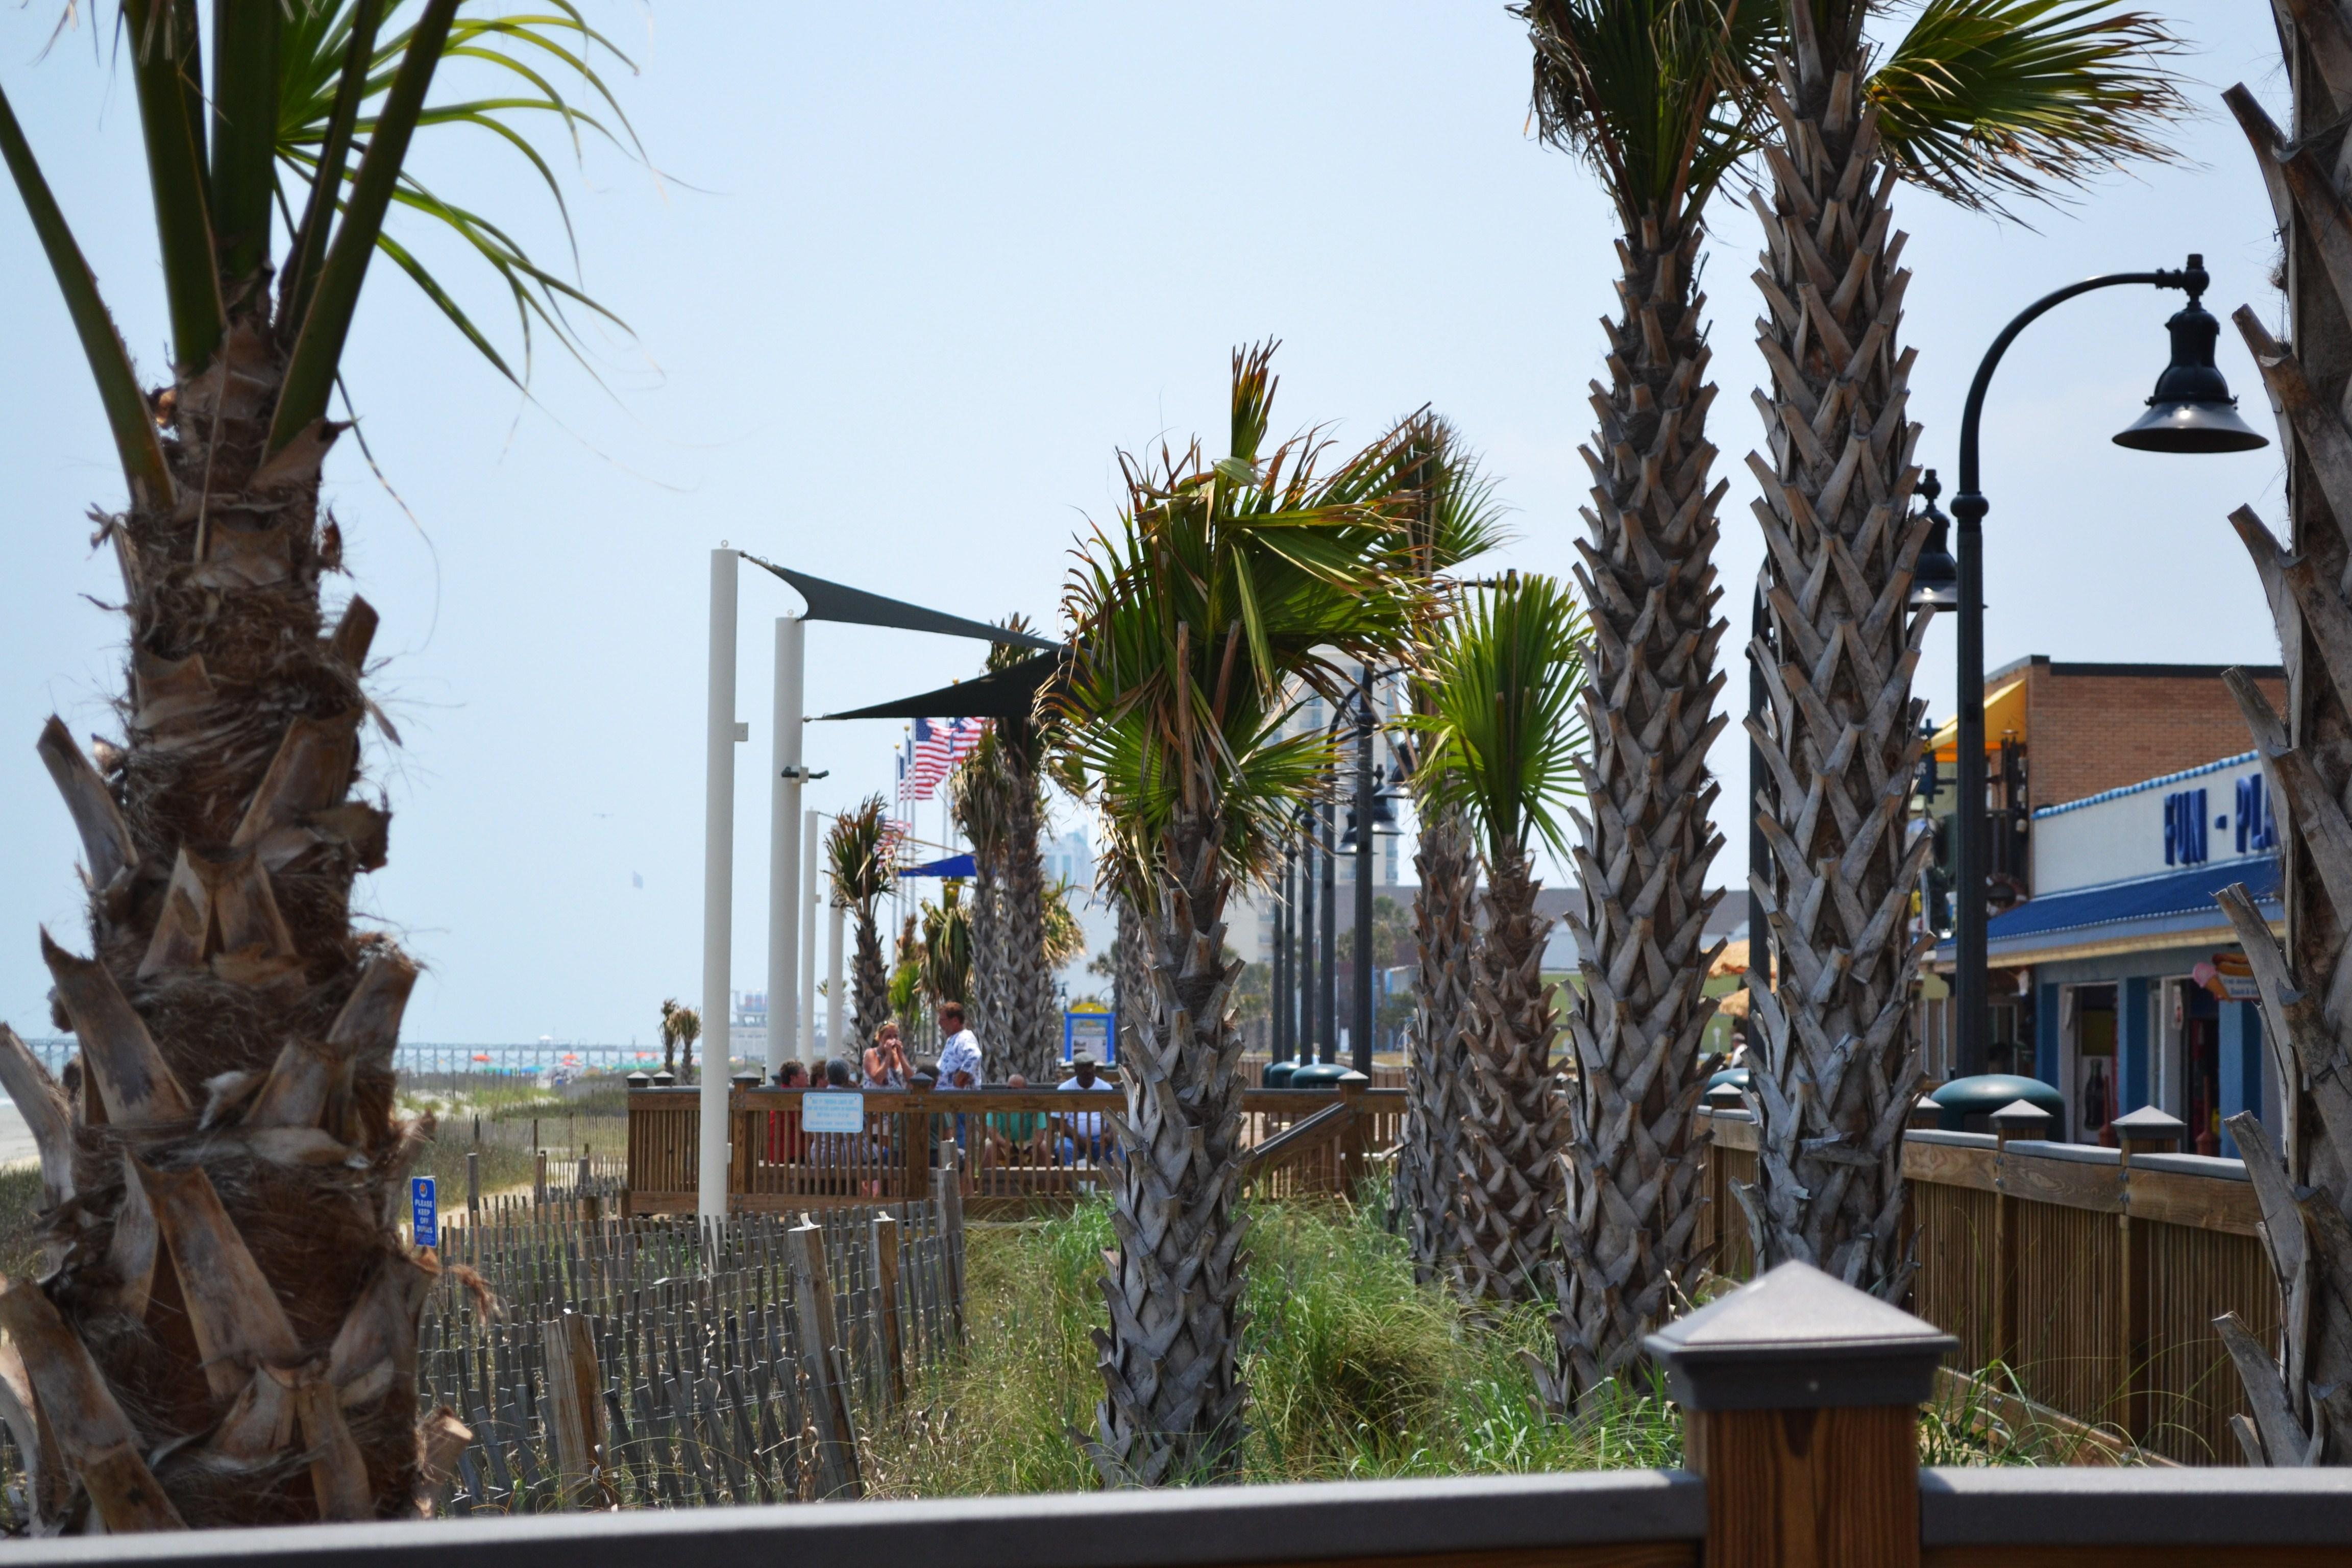 Myrtle Beach Palm Trees 2 By Mrschibi